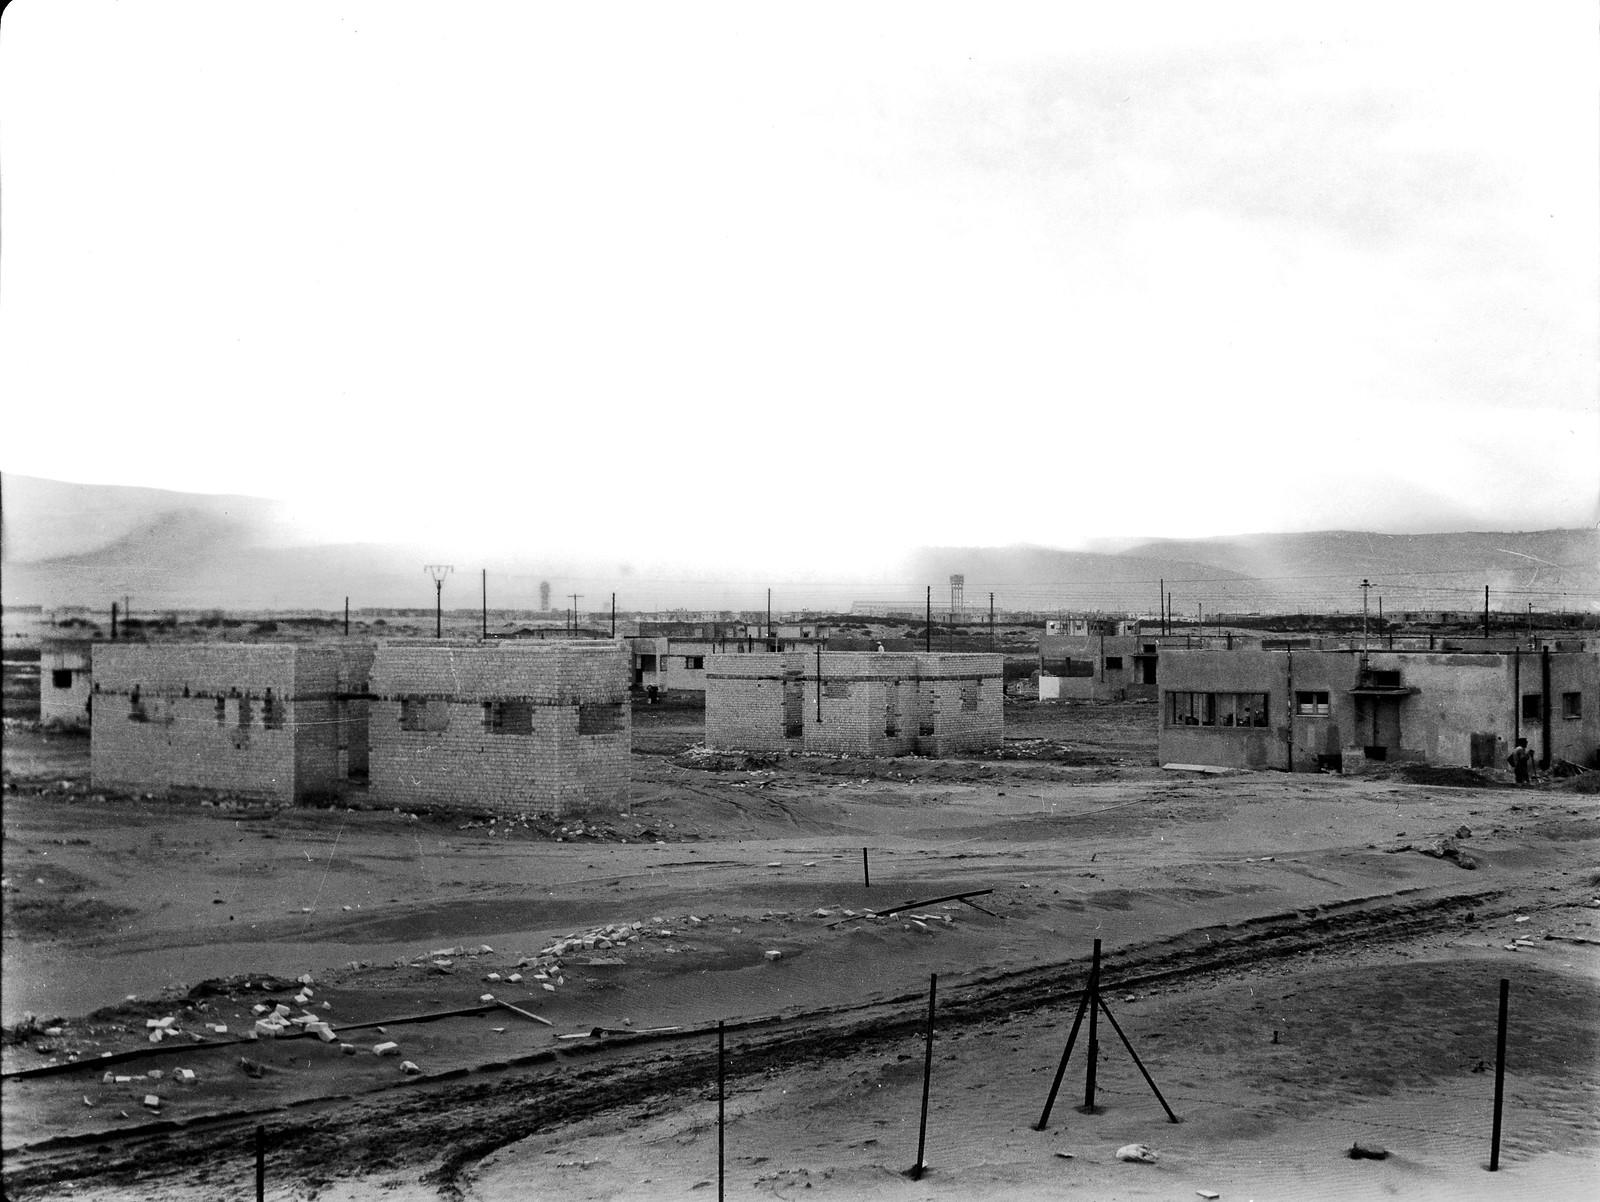 32. Хайфа. Жилищное строительство. Развитие района Хайфского залива